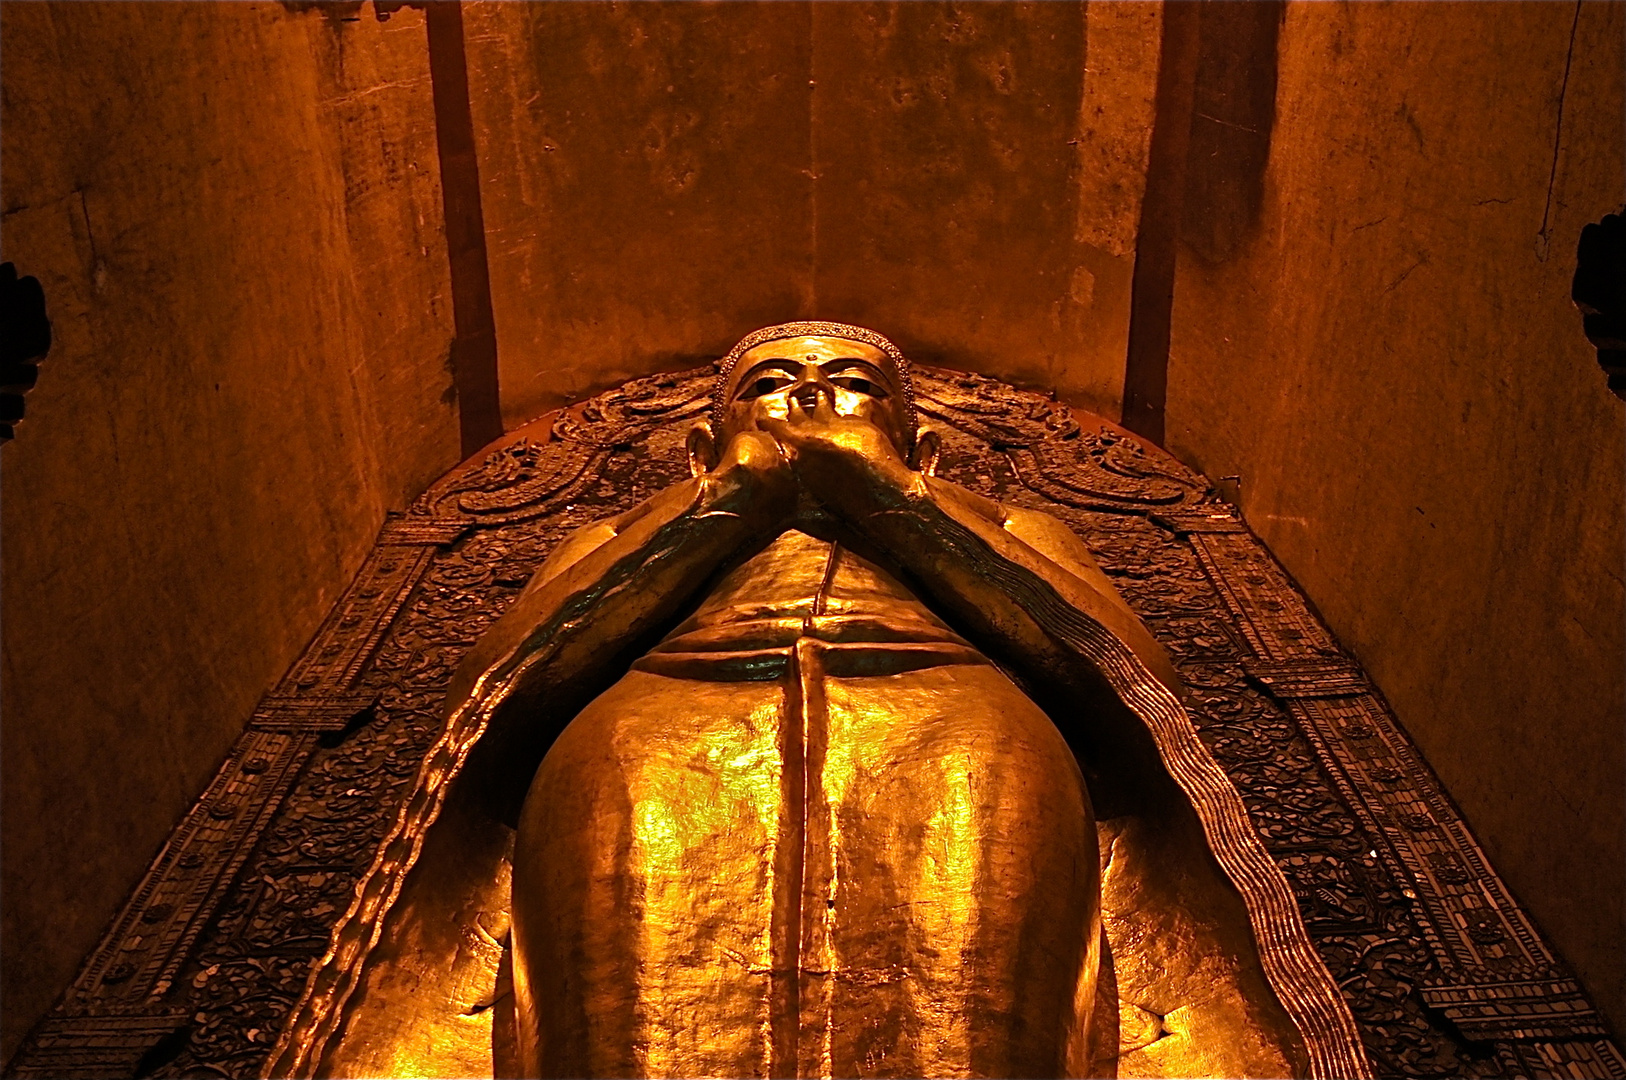 buddhastatue in bagan, burma 2011